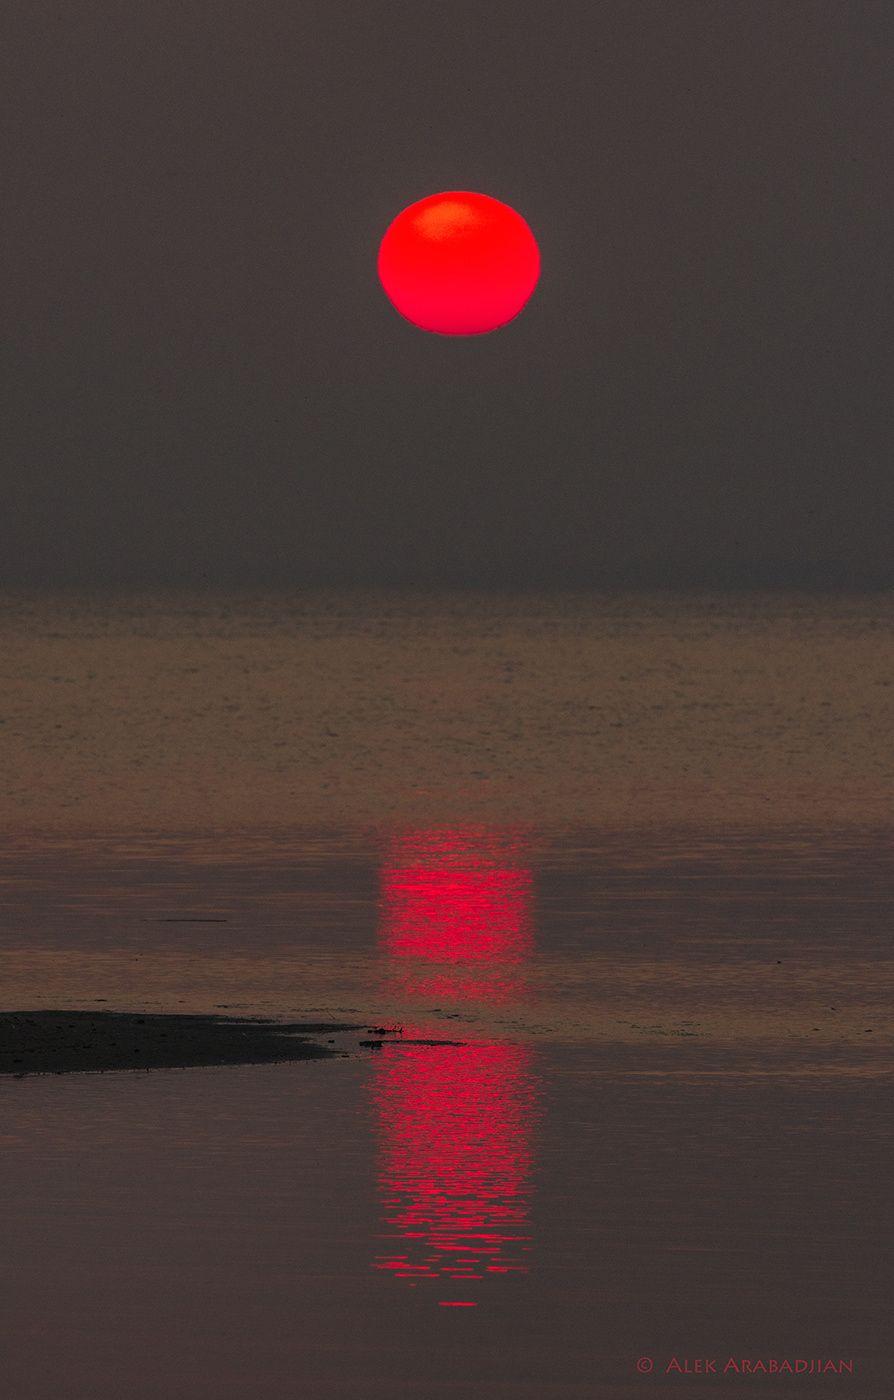 November Red - Red Sundown at the Meditarean Sea near Porto Lagos, Greece, by Alek Arabadjian...